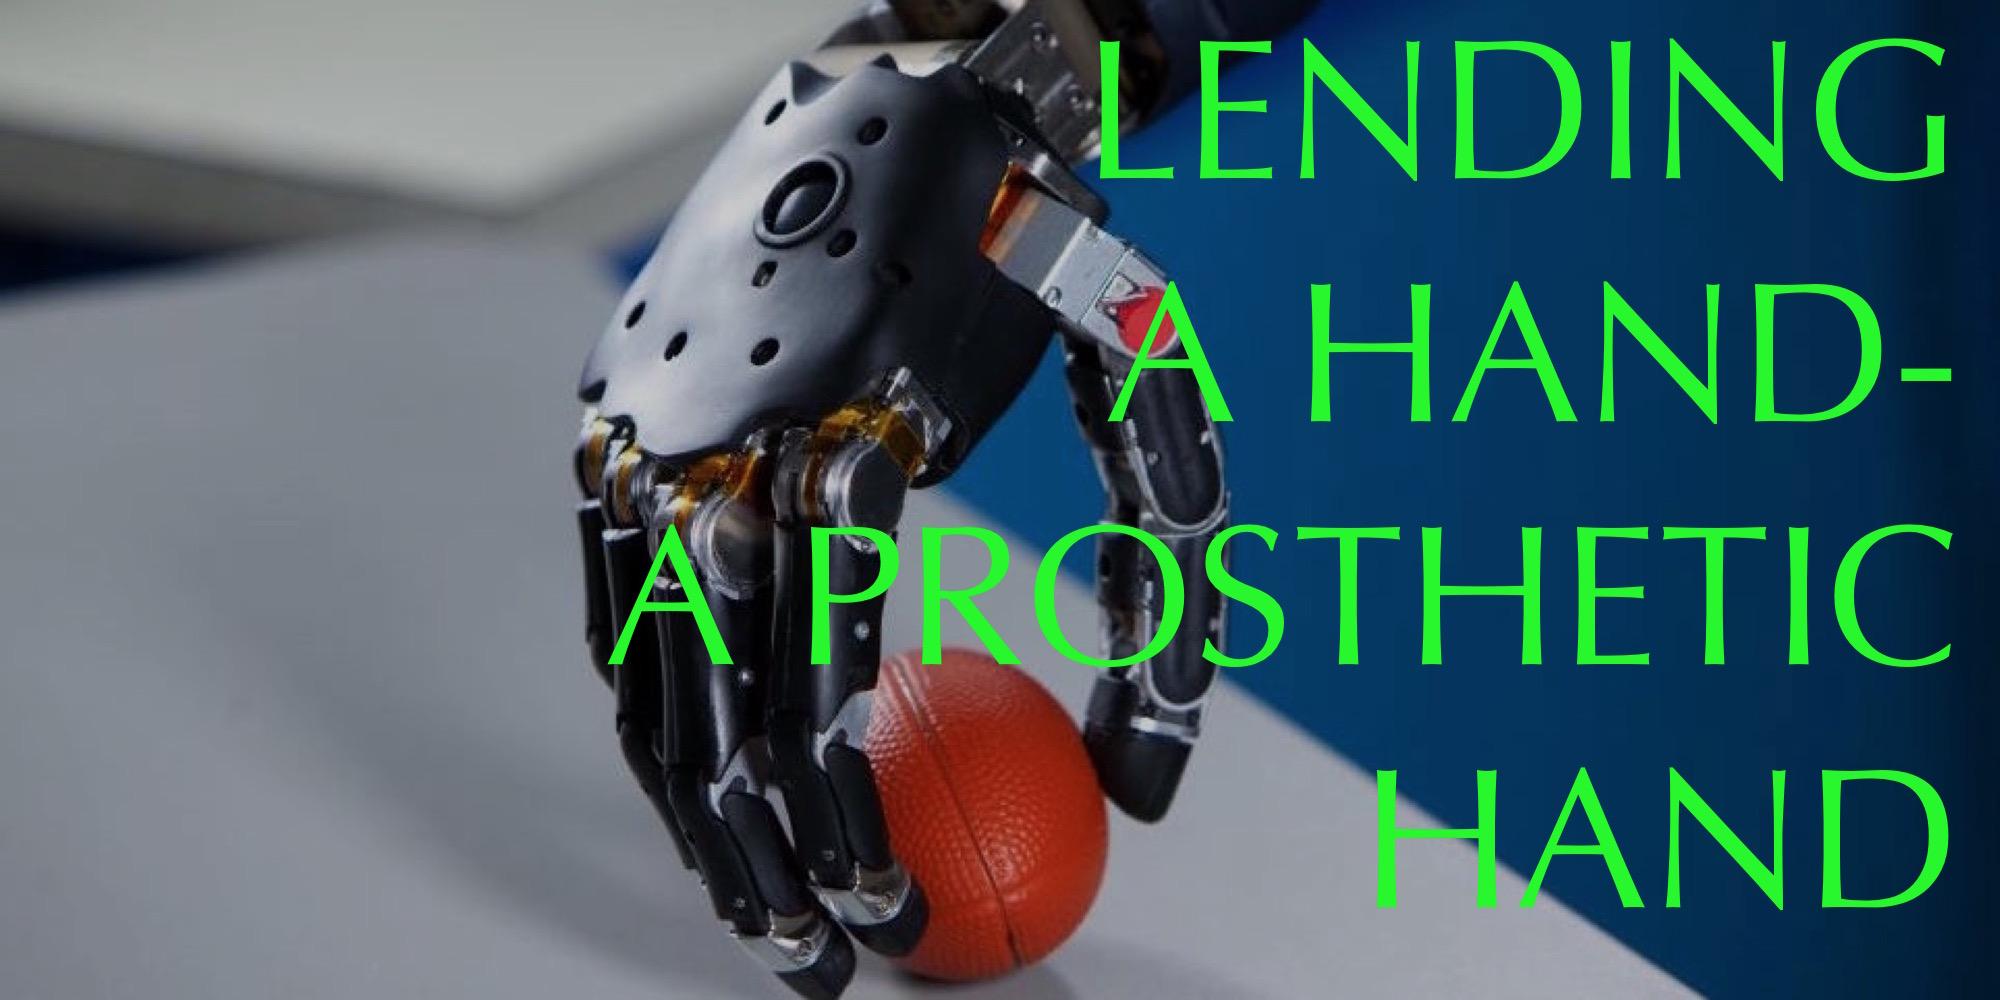 Lending a Hand – a Prosthetic Hand